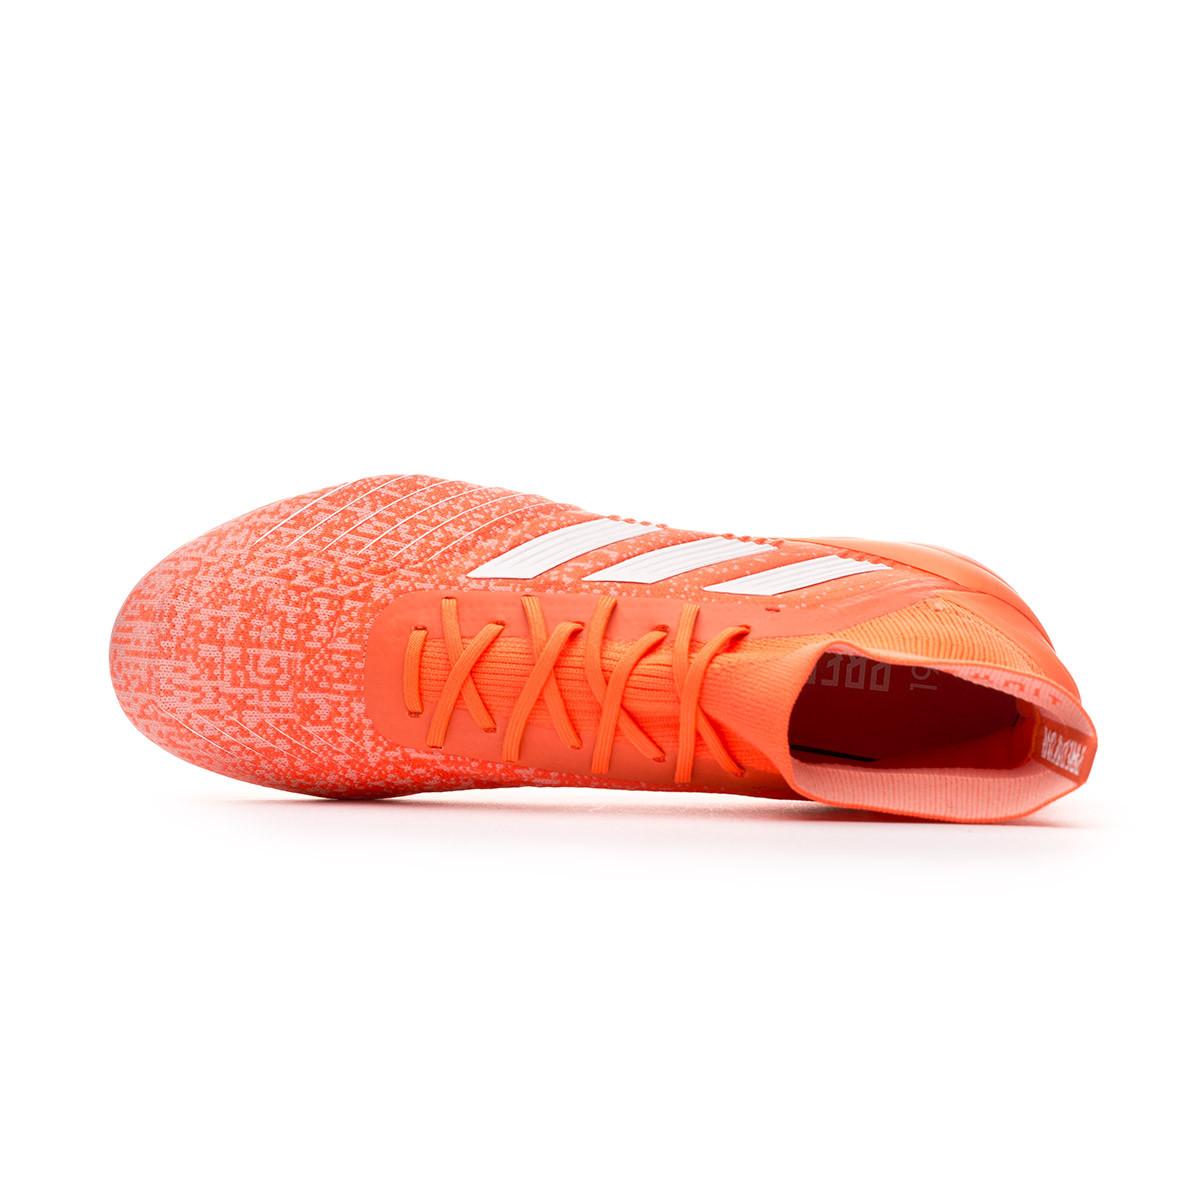 adidas scarpe donna quando questa all lieone